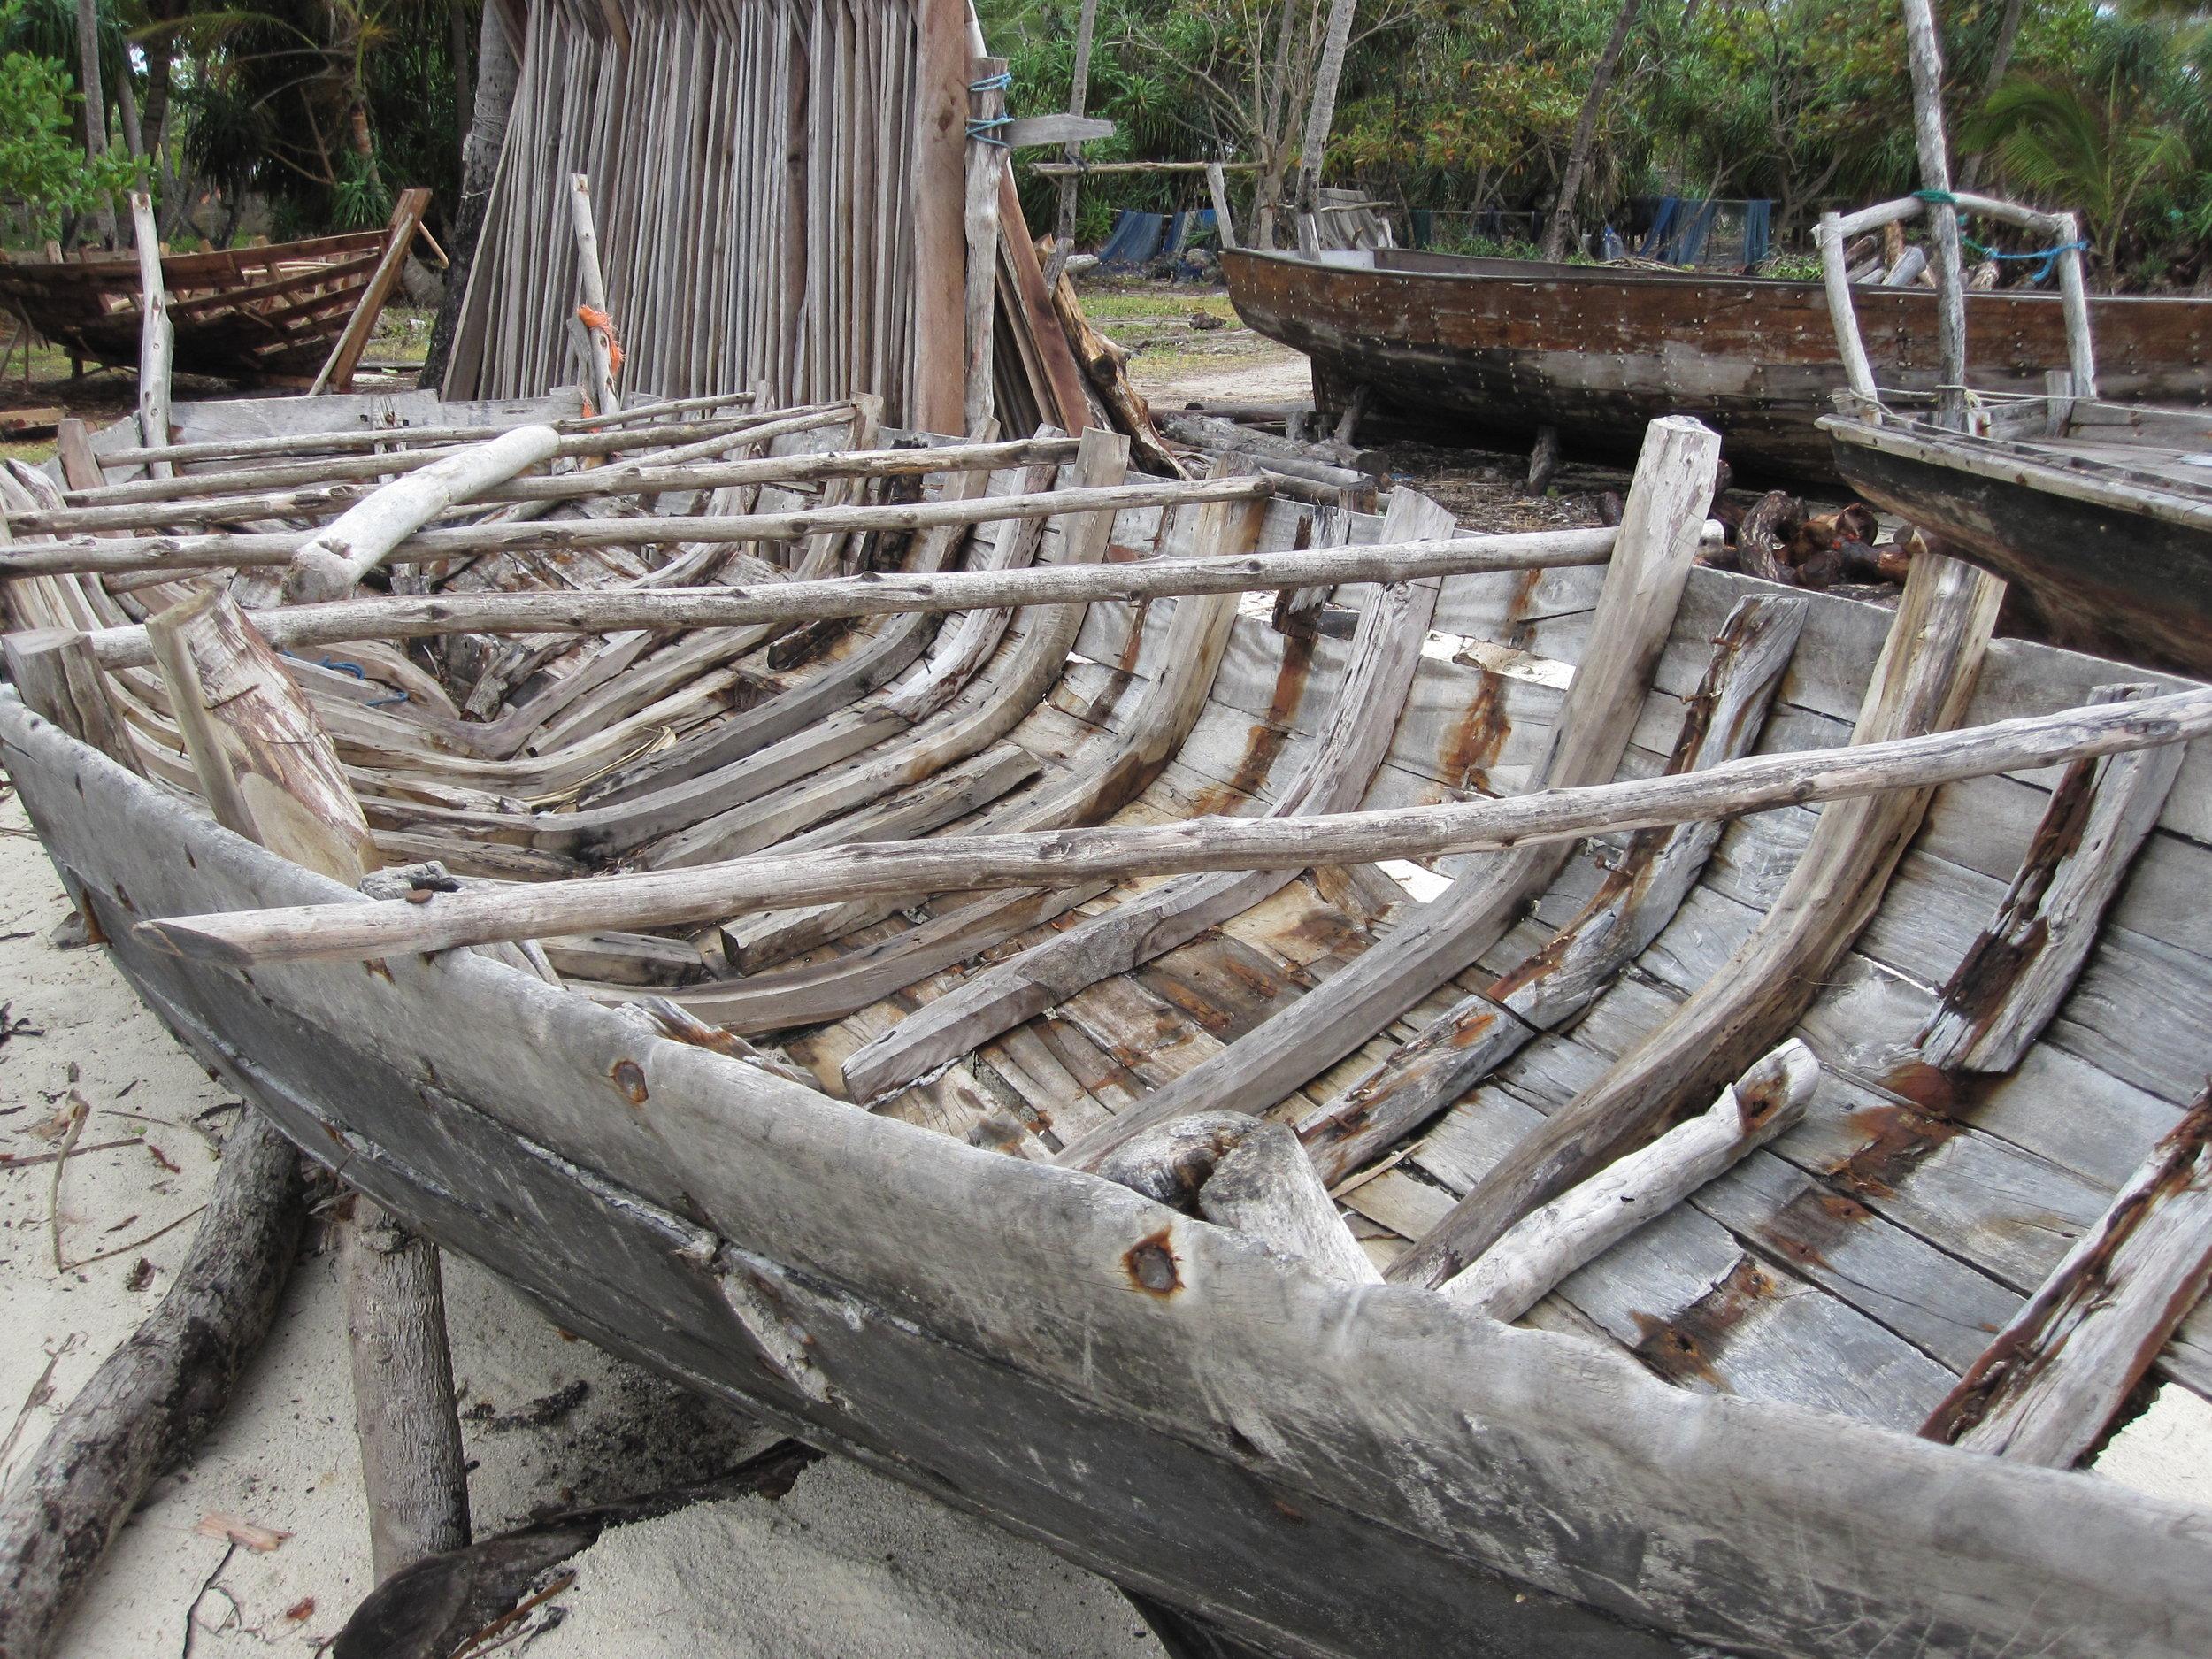 A dhow being built in Zanzibar